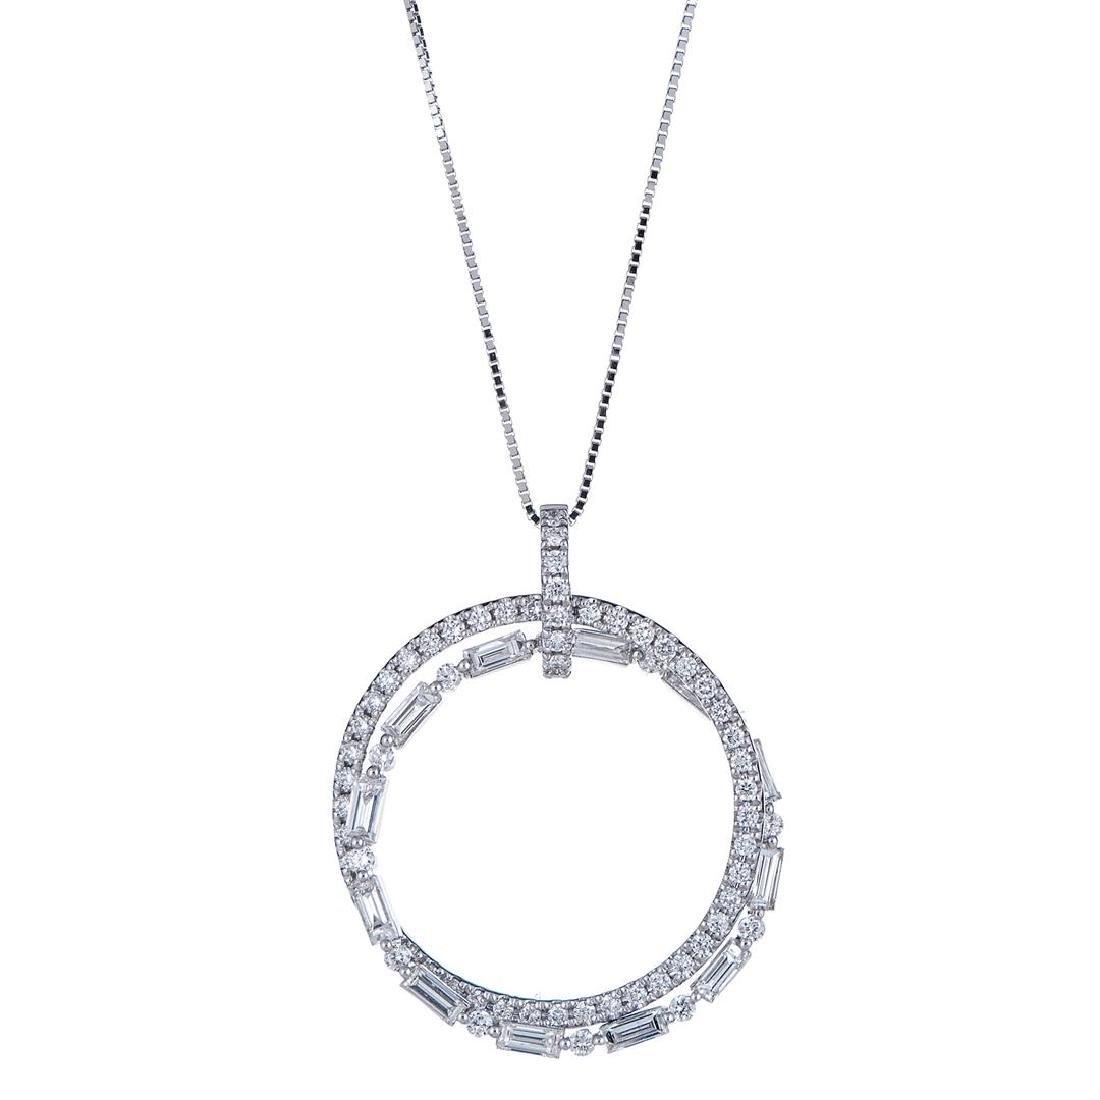 0.77 ctw Diamond Pendant - 18KT White Gold